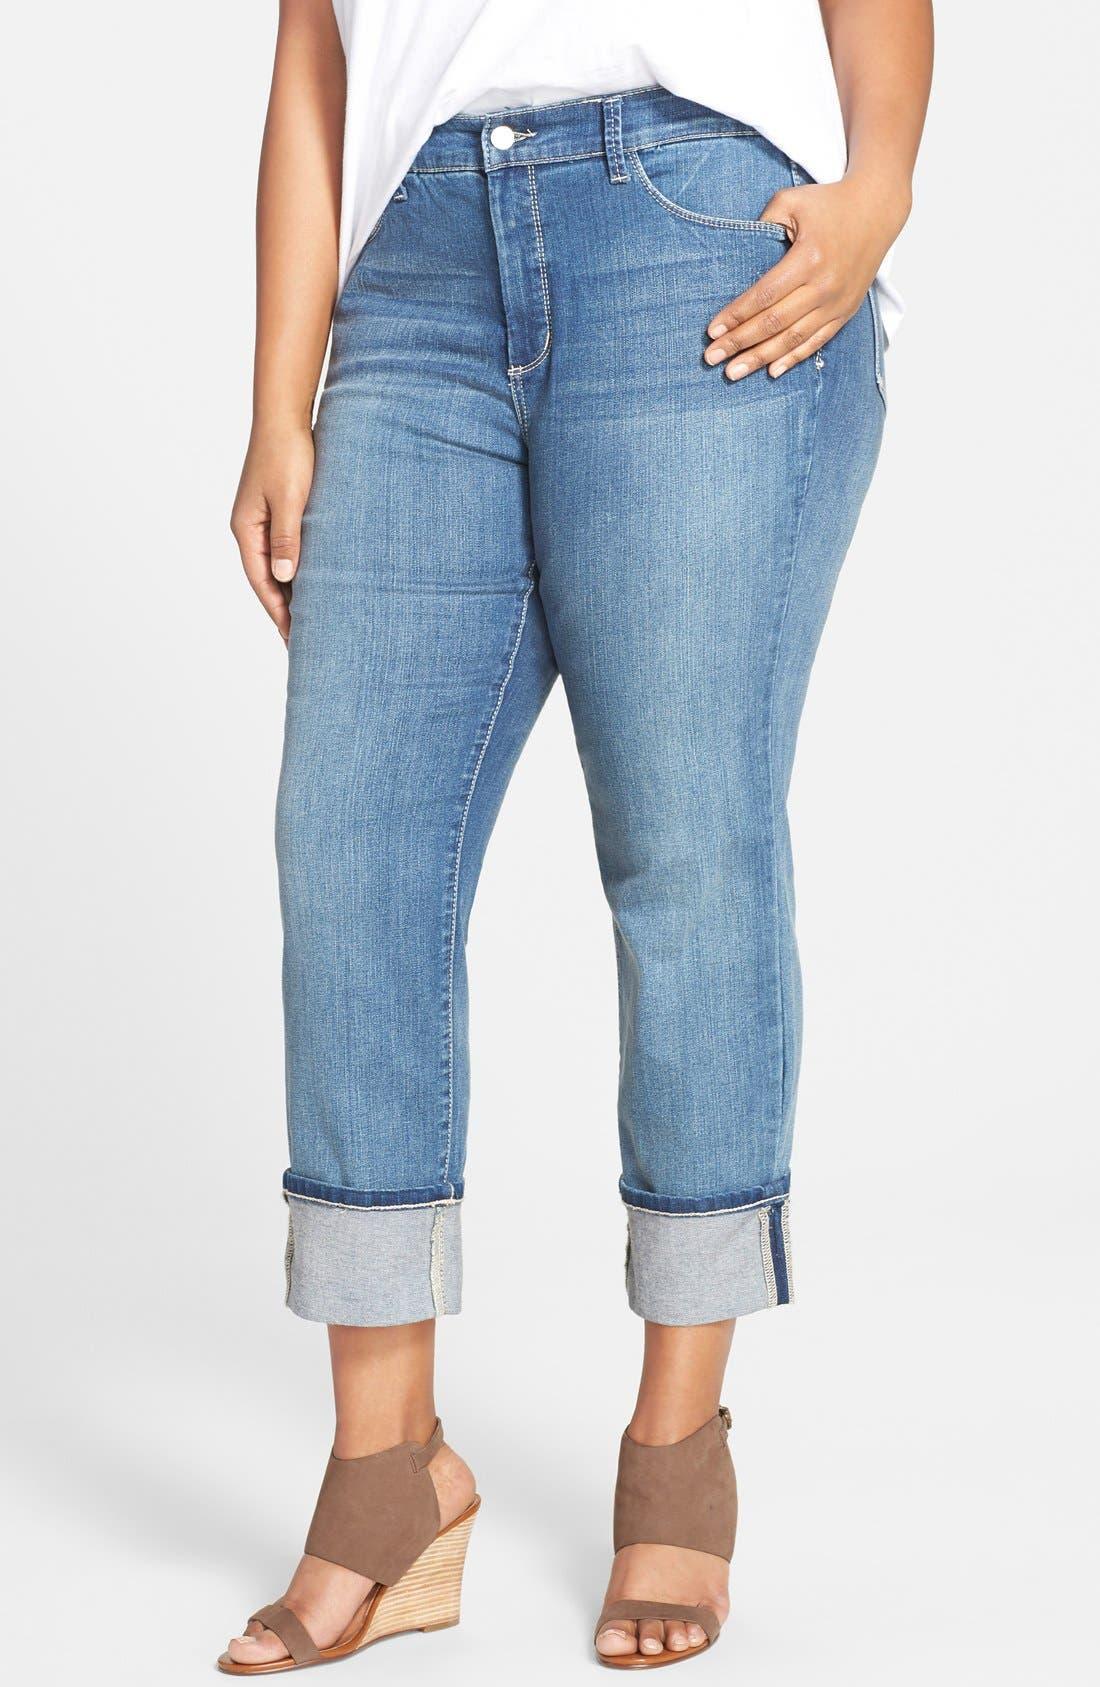 NYDJ Loreena Stretch Roll Cuff Crop Boyfriend Jeans